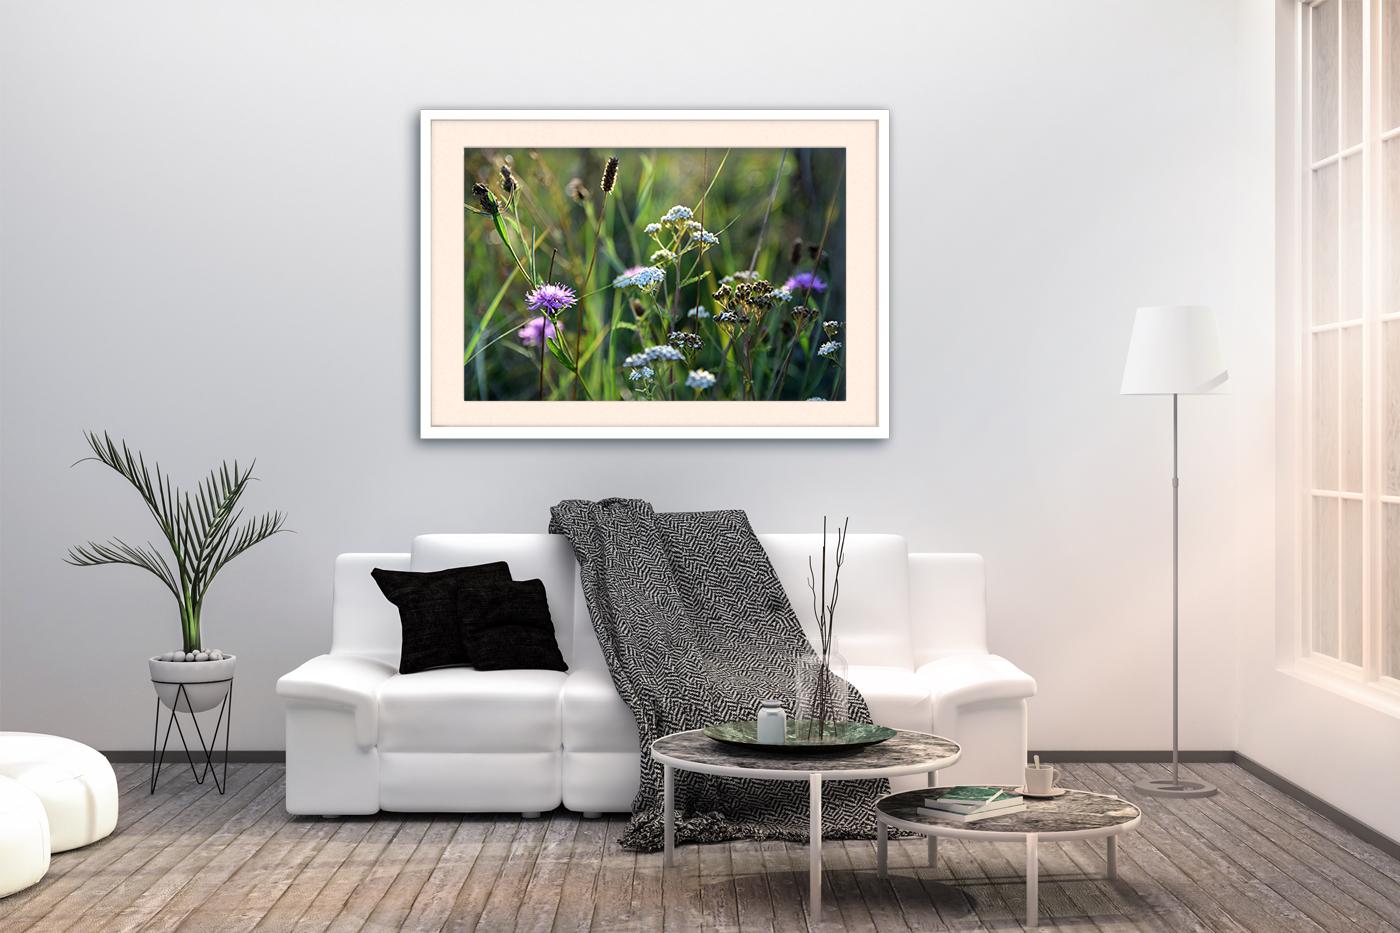 Nature photo, landscape photo, floral photo, summer photo, example image 3